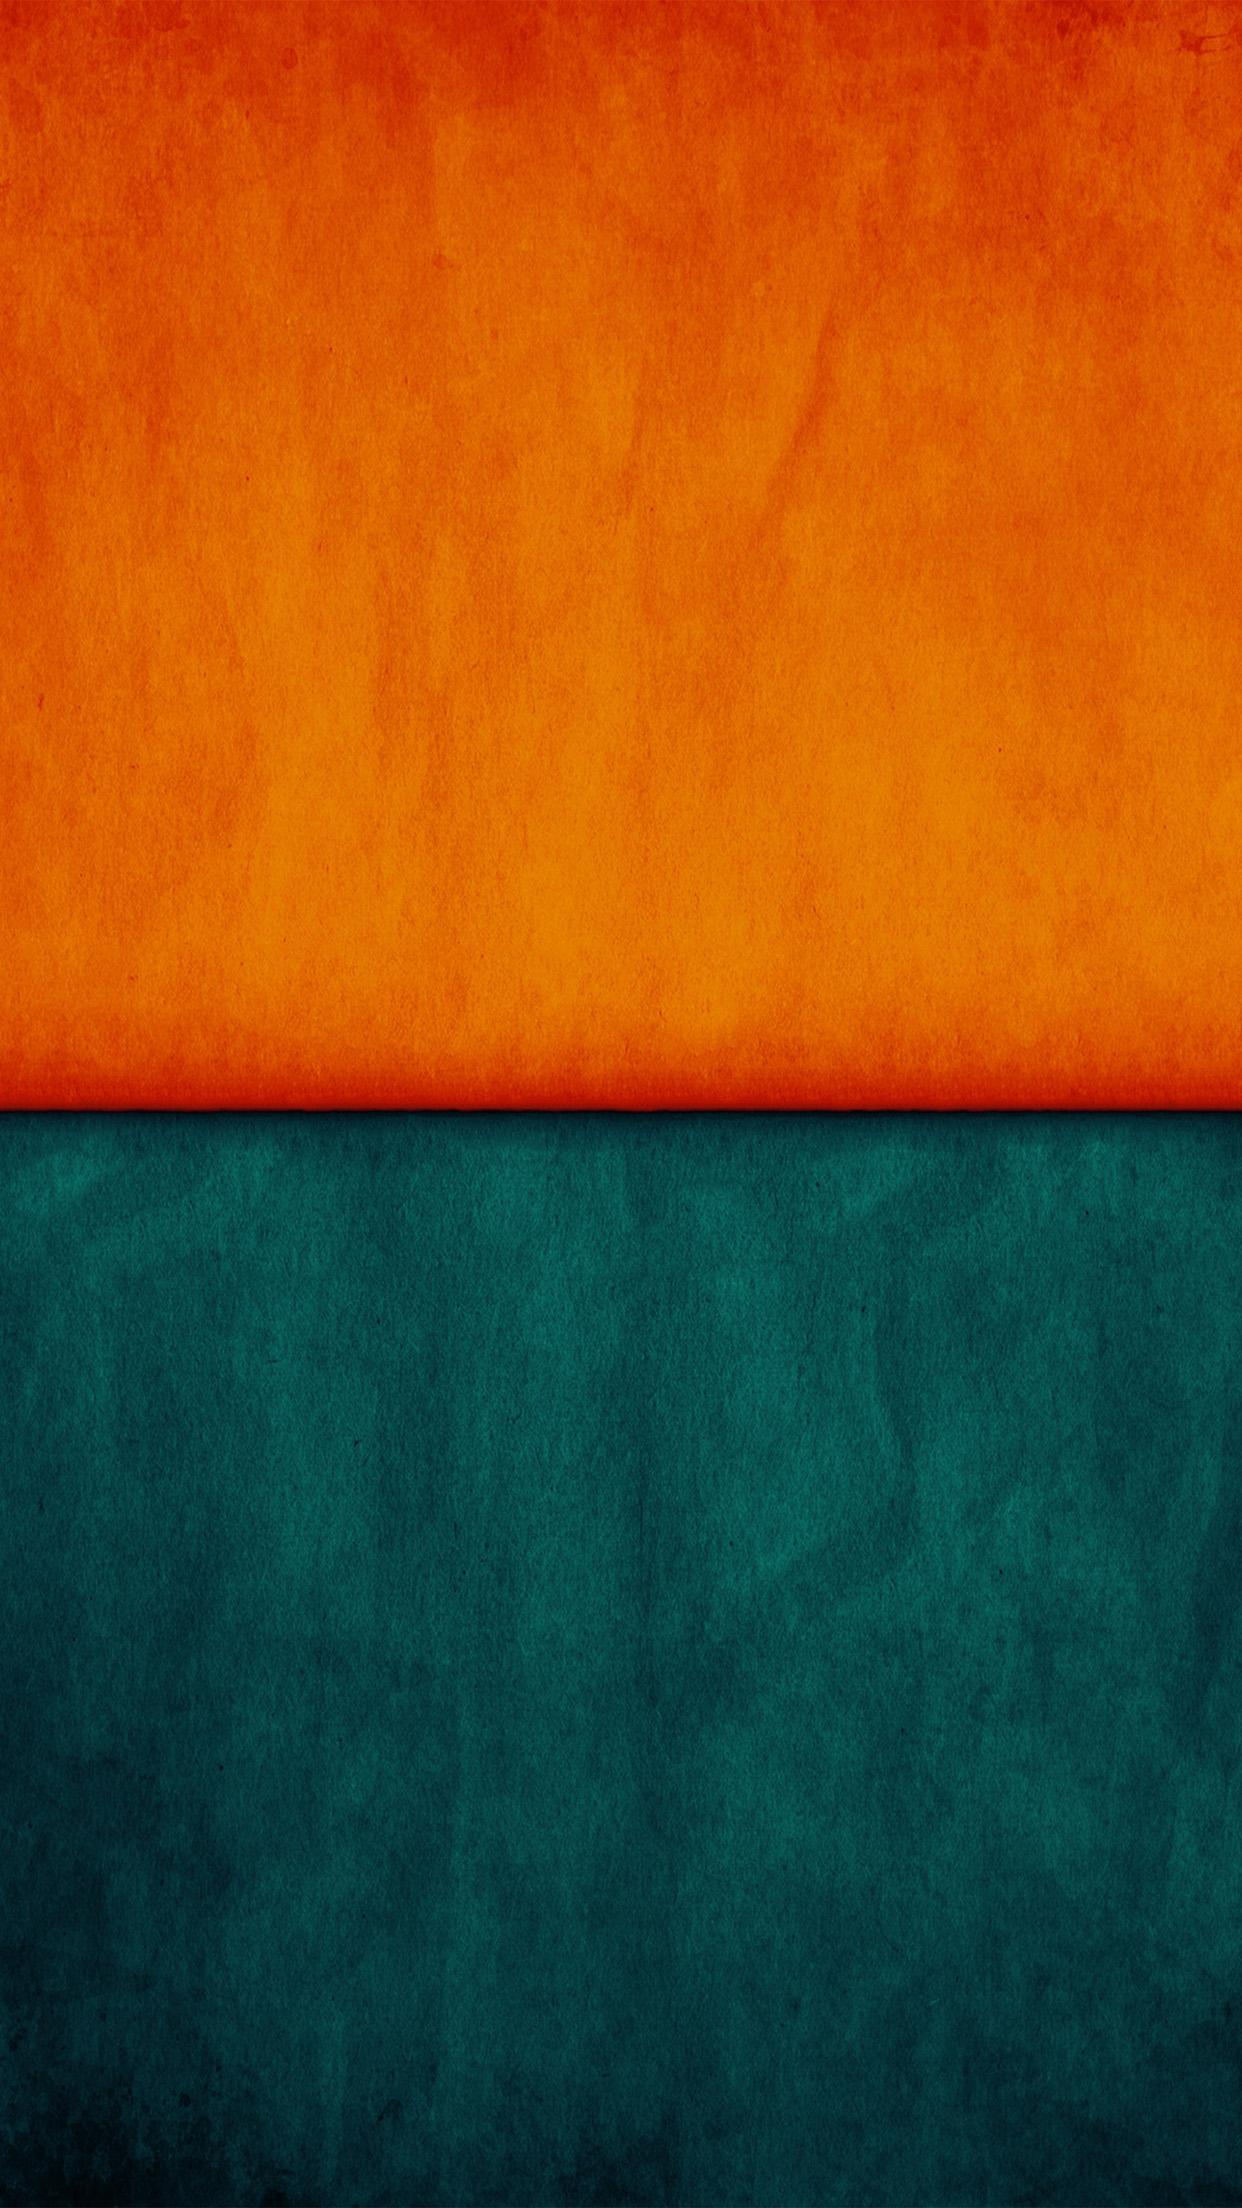 Cute Fall Wallpaper Iphone 6 Papers Co Iphone Wallpaper Vx27 Orange Blue Pattern